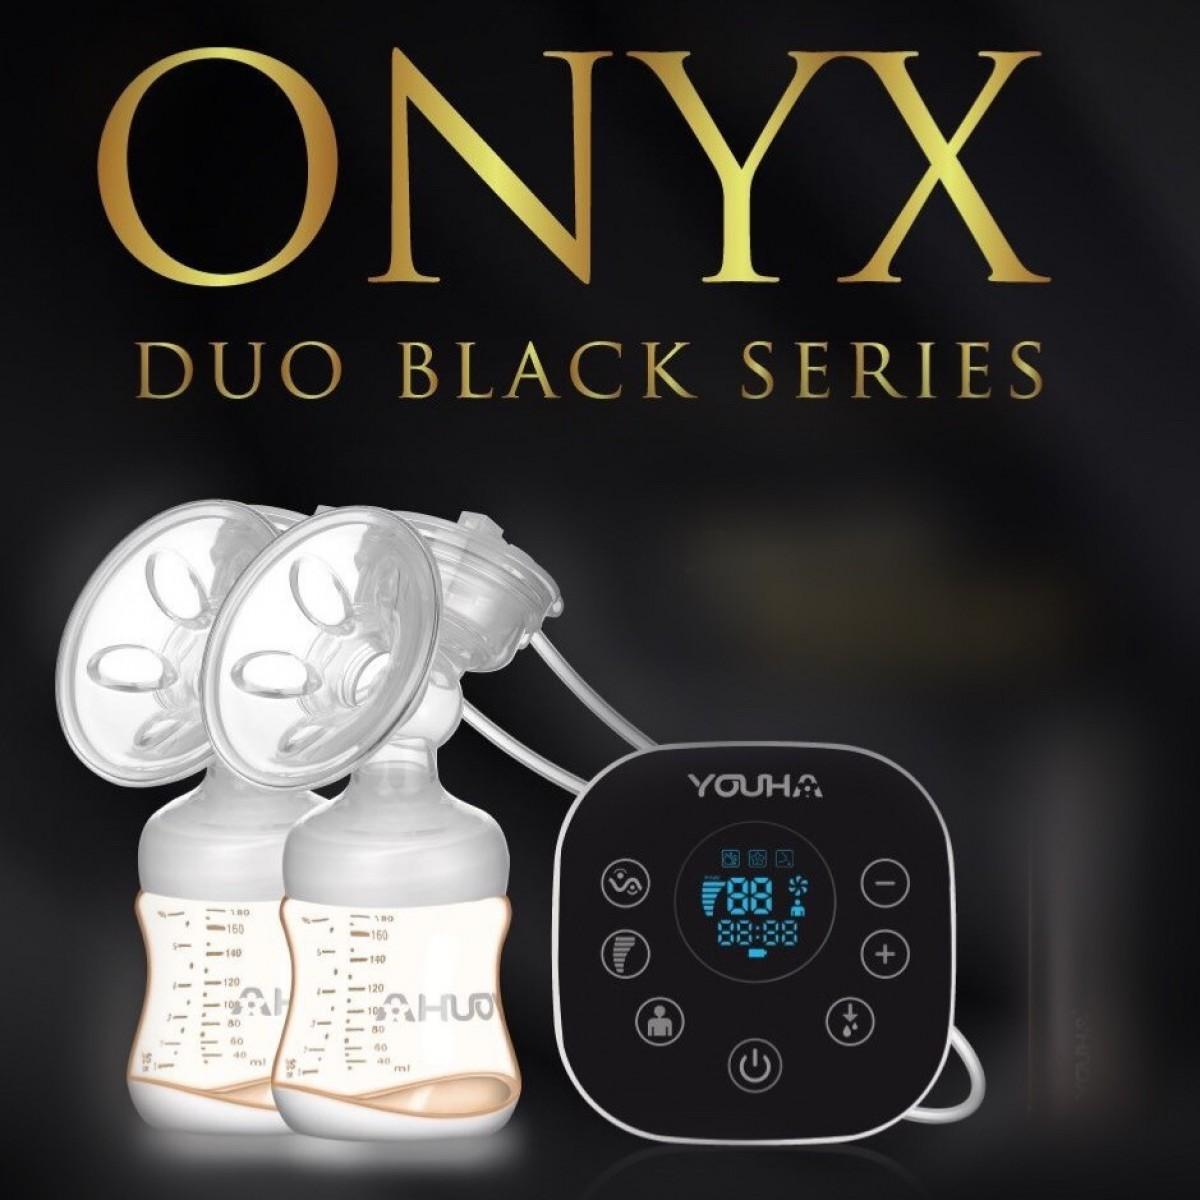 Youha Black Series Onxy Double Breast Pump+ Foc Youha Cooler Bag - Kico Baby Center